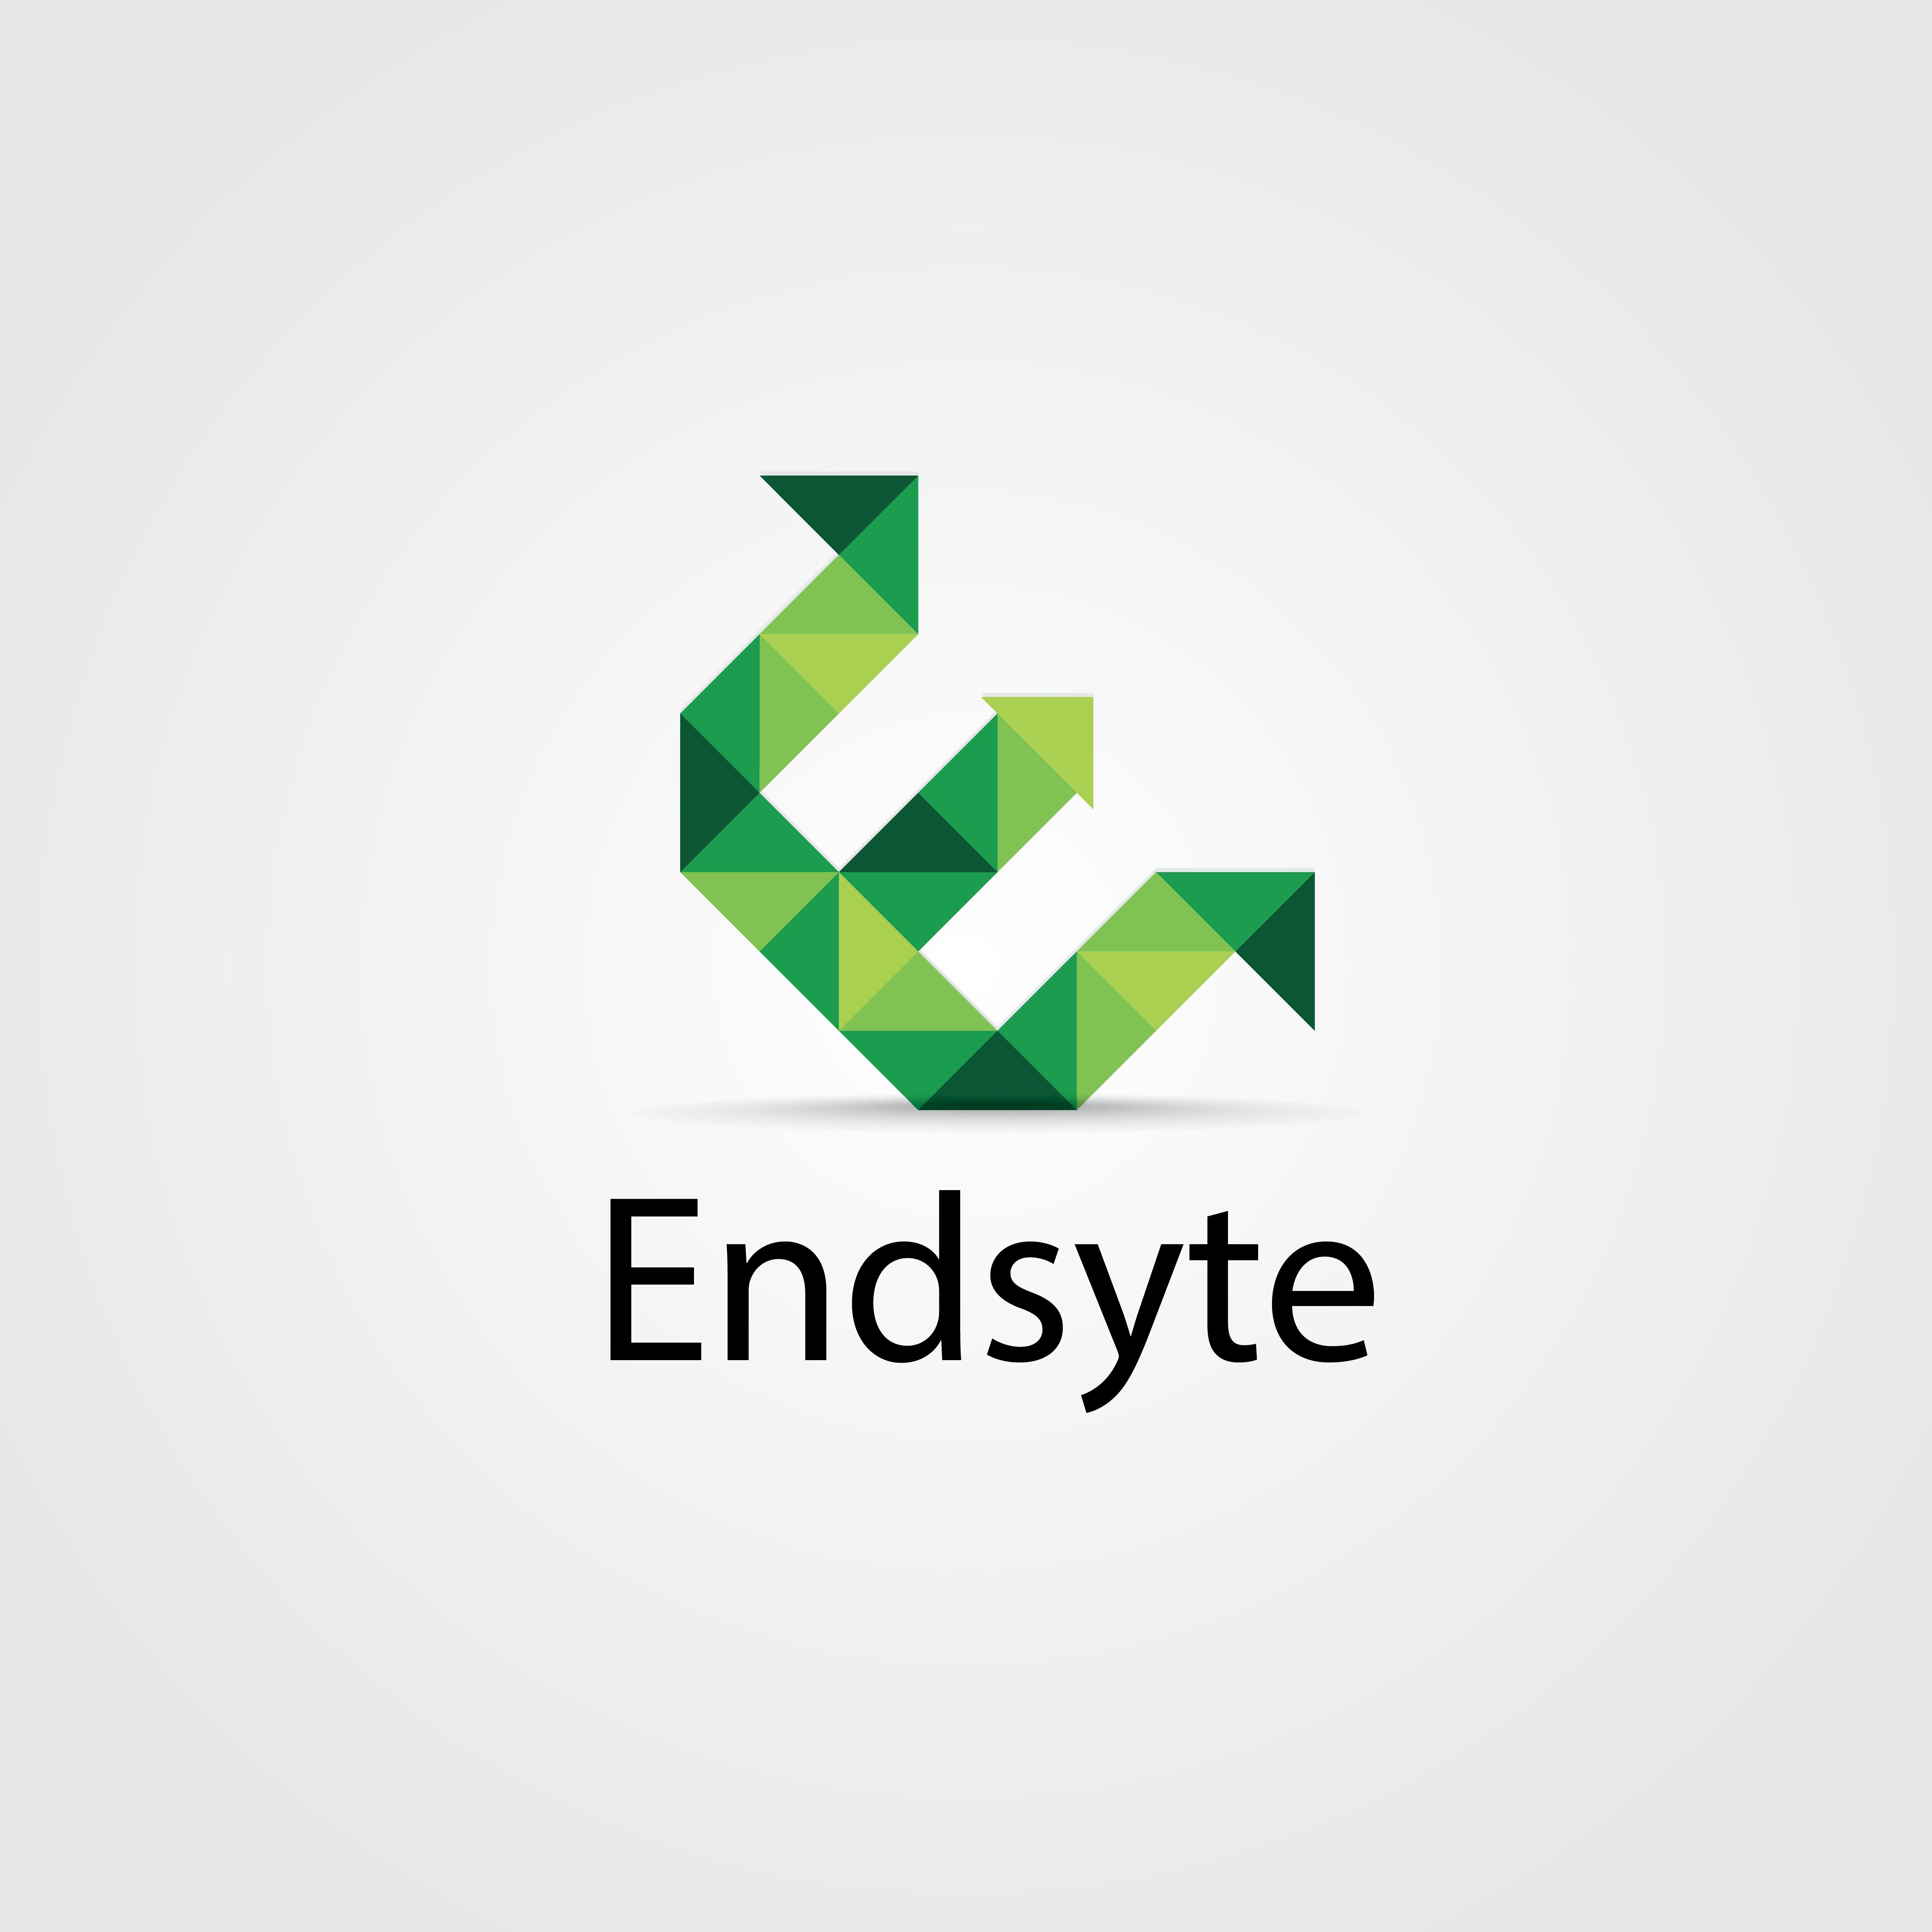 Endsyte's logo